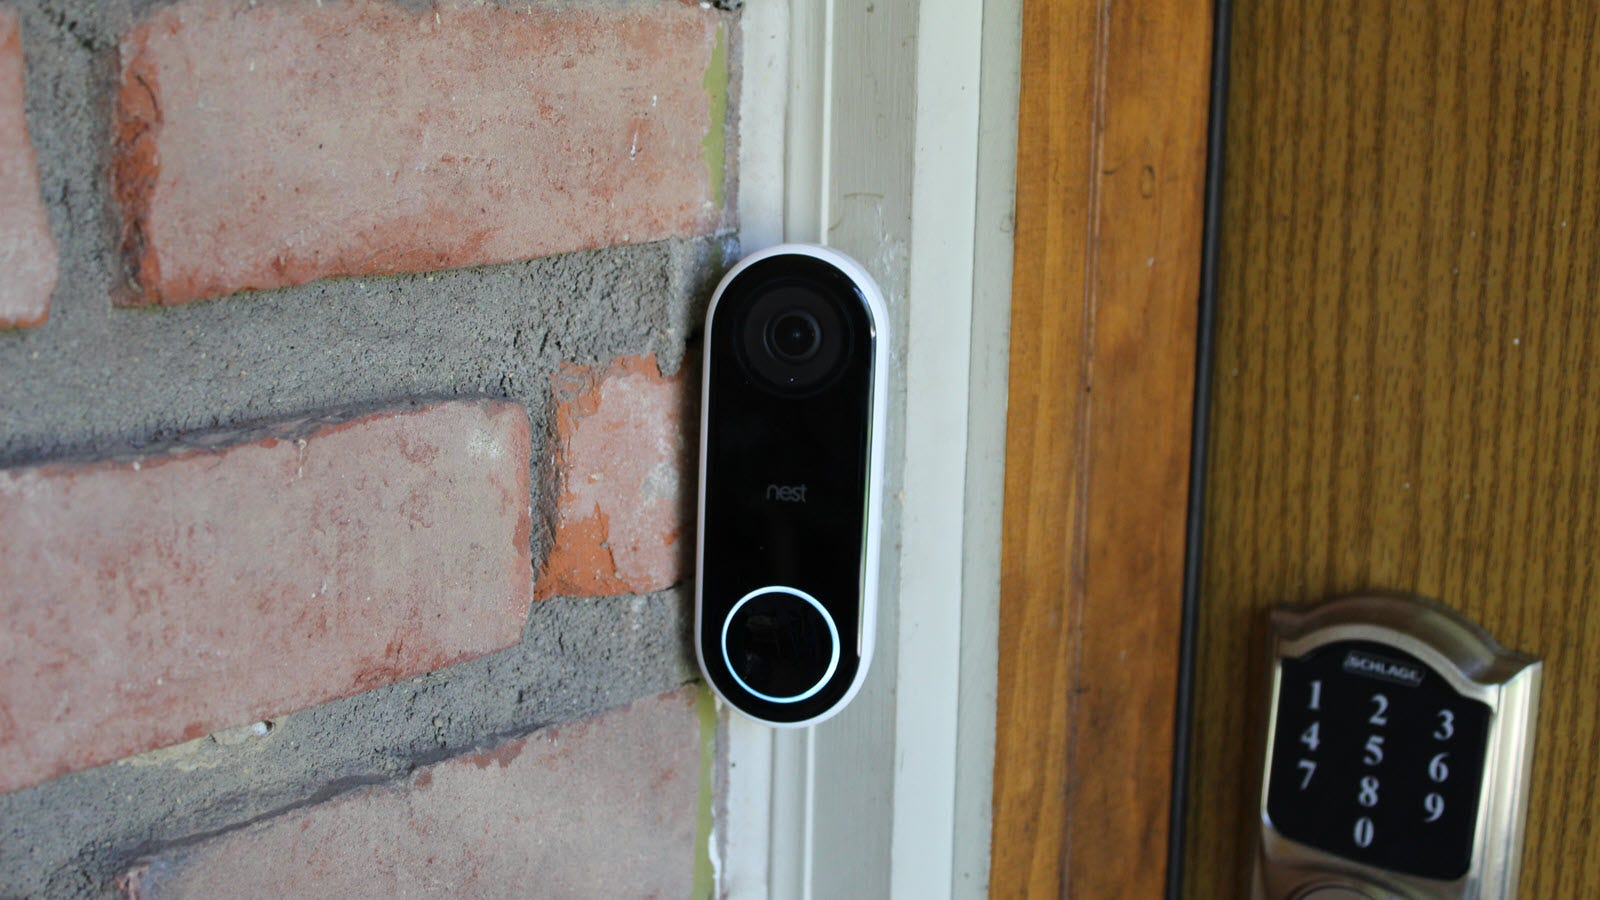 A Nest Hello Video doorbell and Schlage Smart lock.